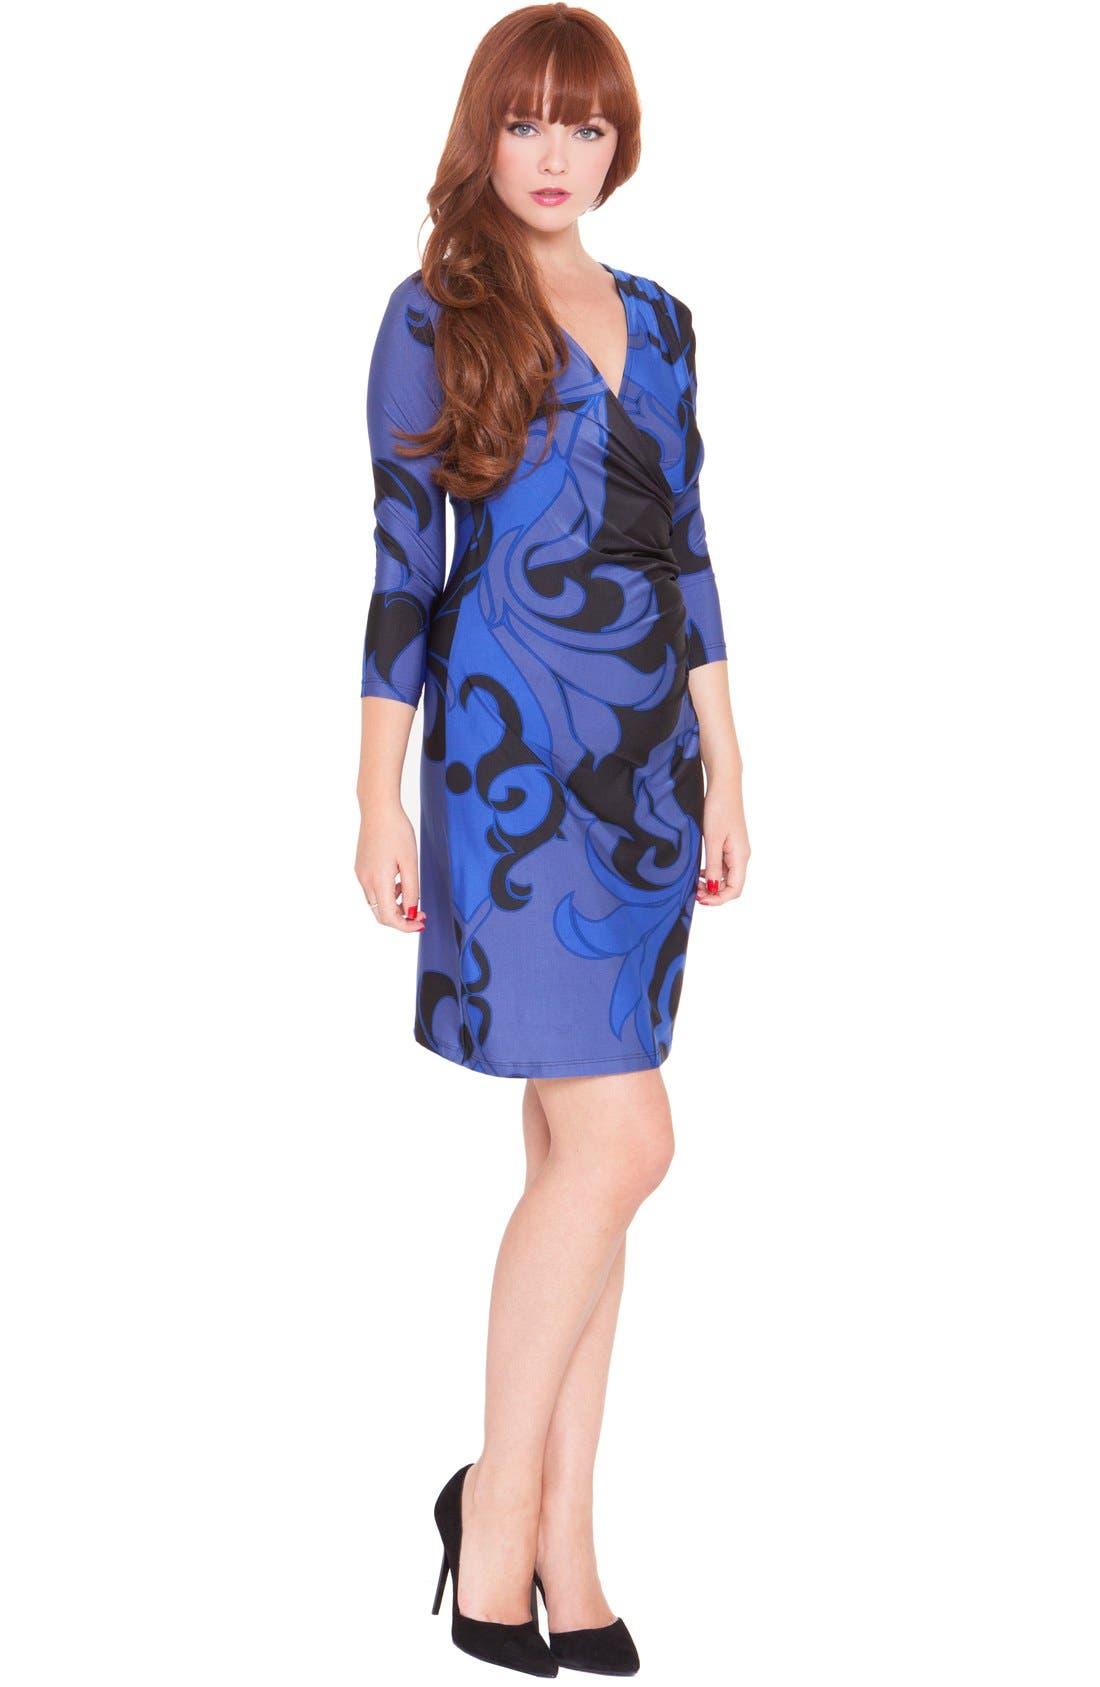 OLIAN 'Katherine' Maternity Wrap Dress